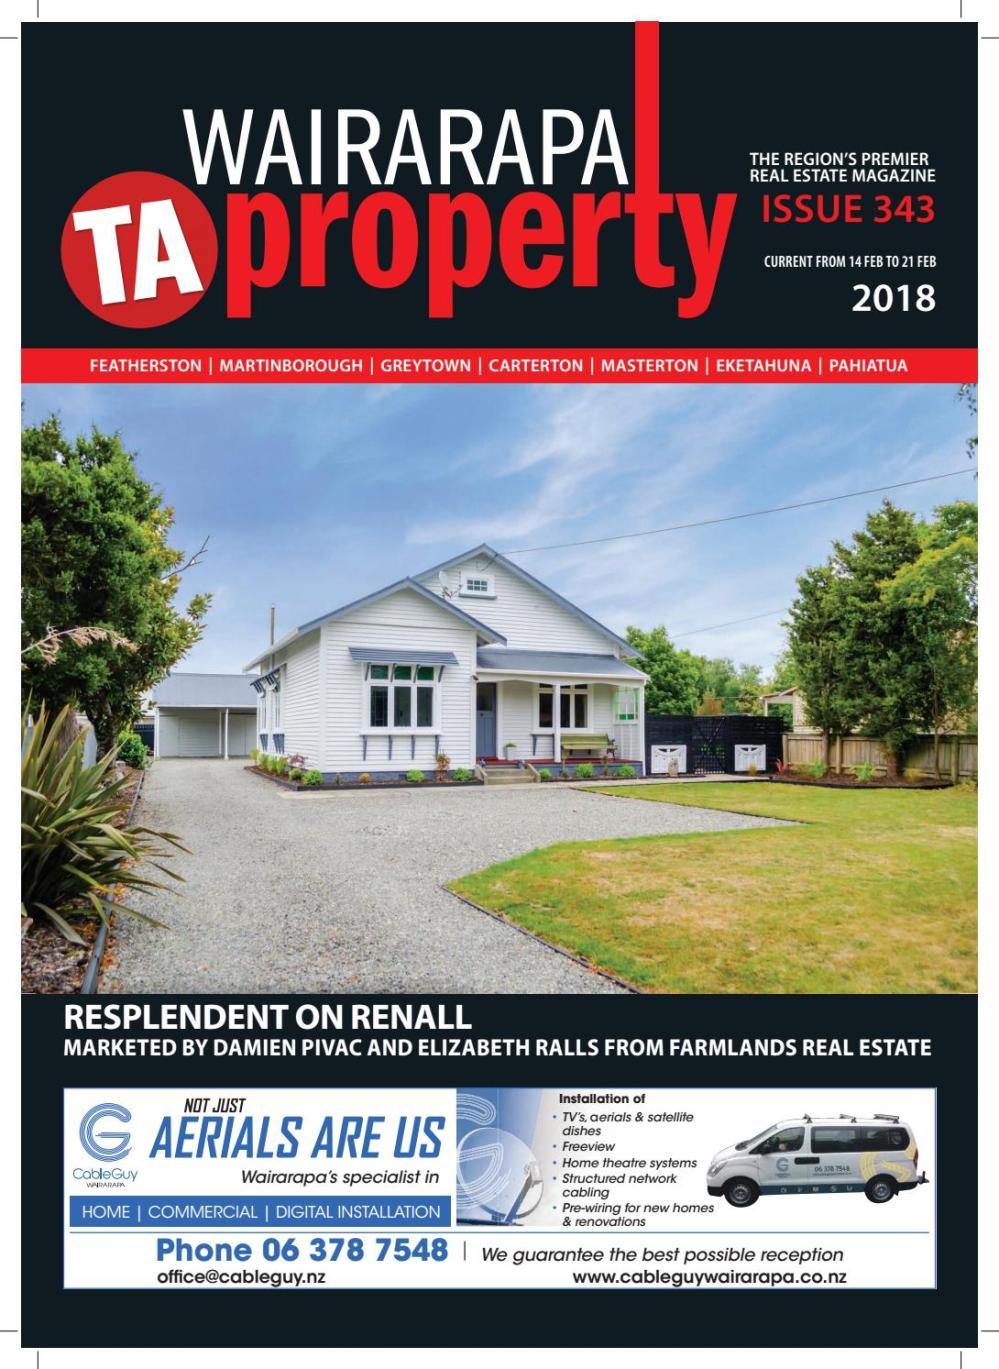 medium resolution of wairarapa property wed 14th february